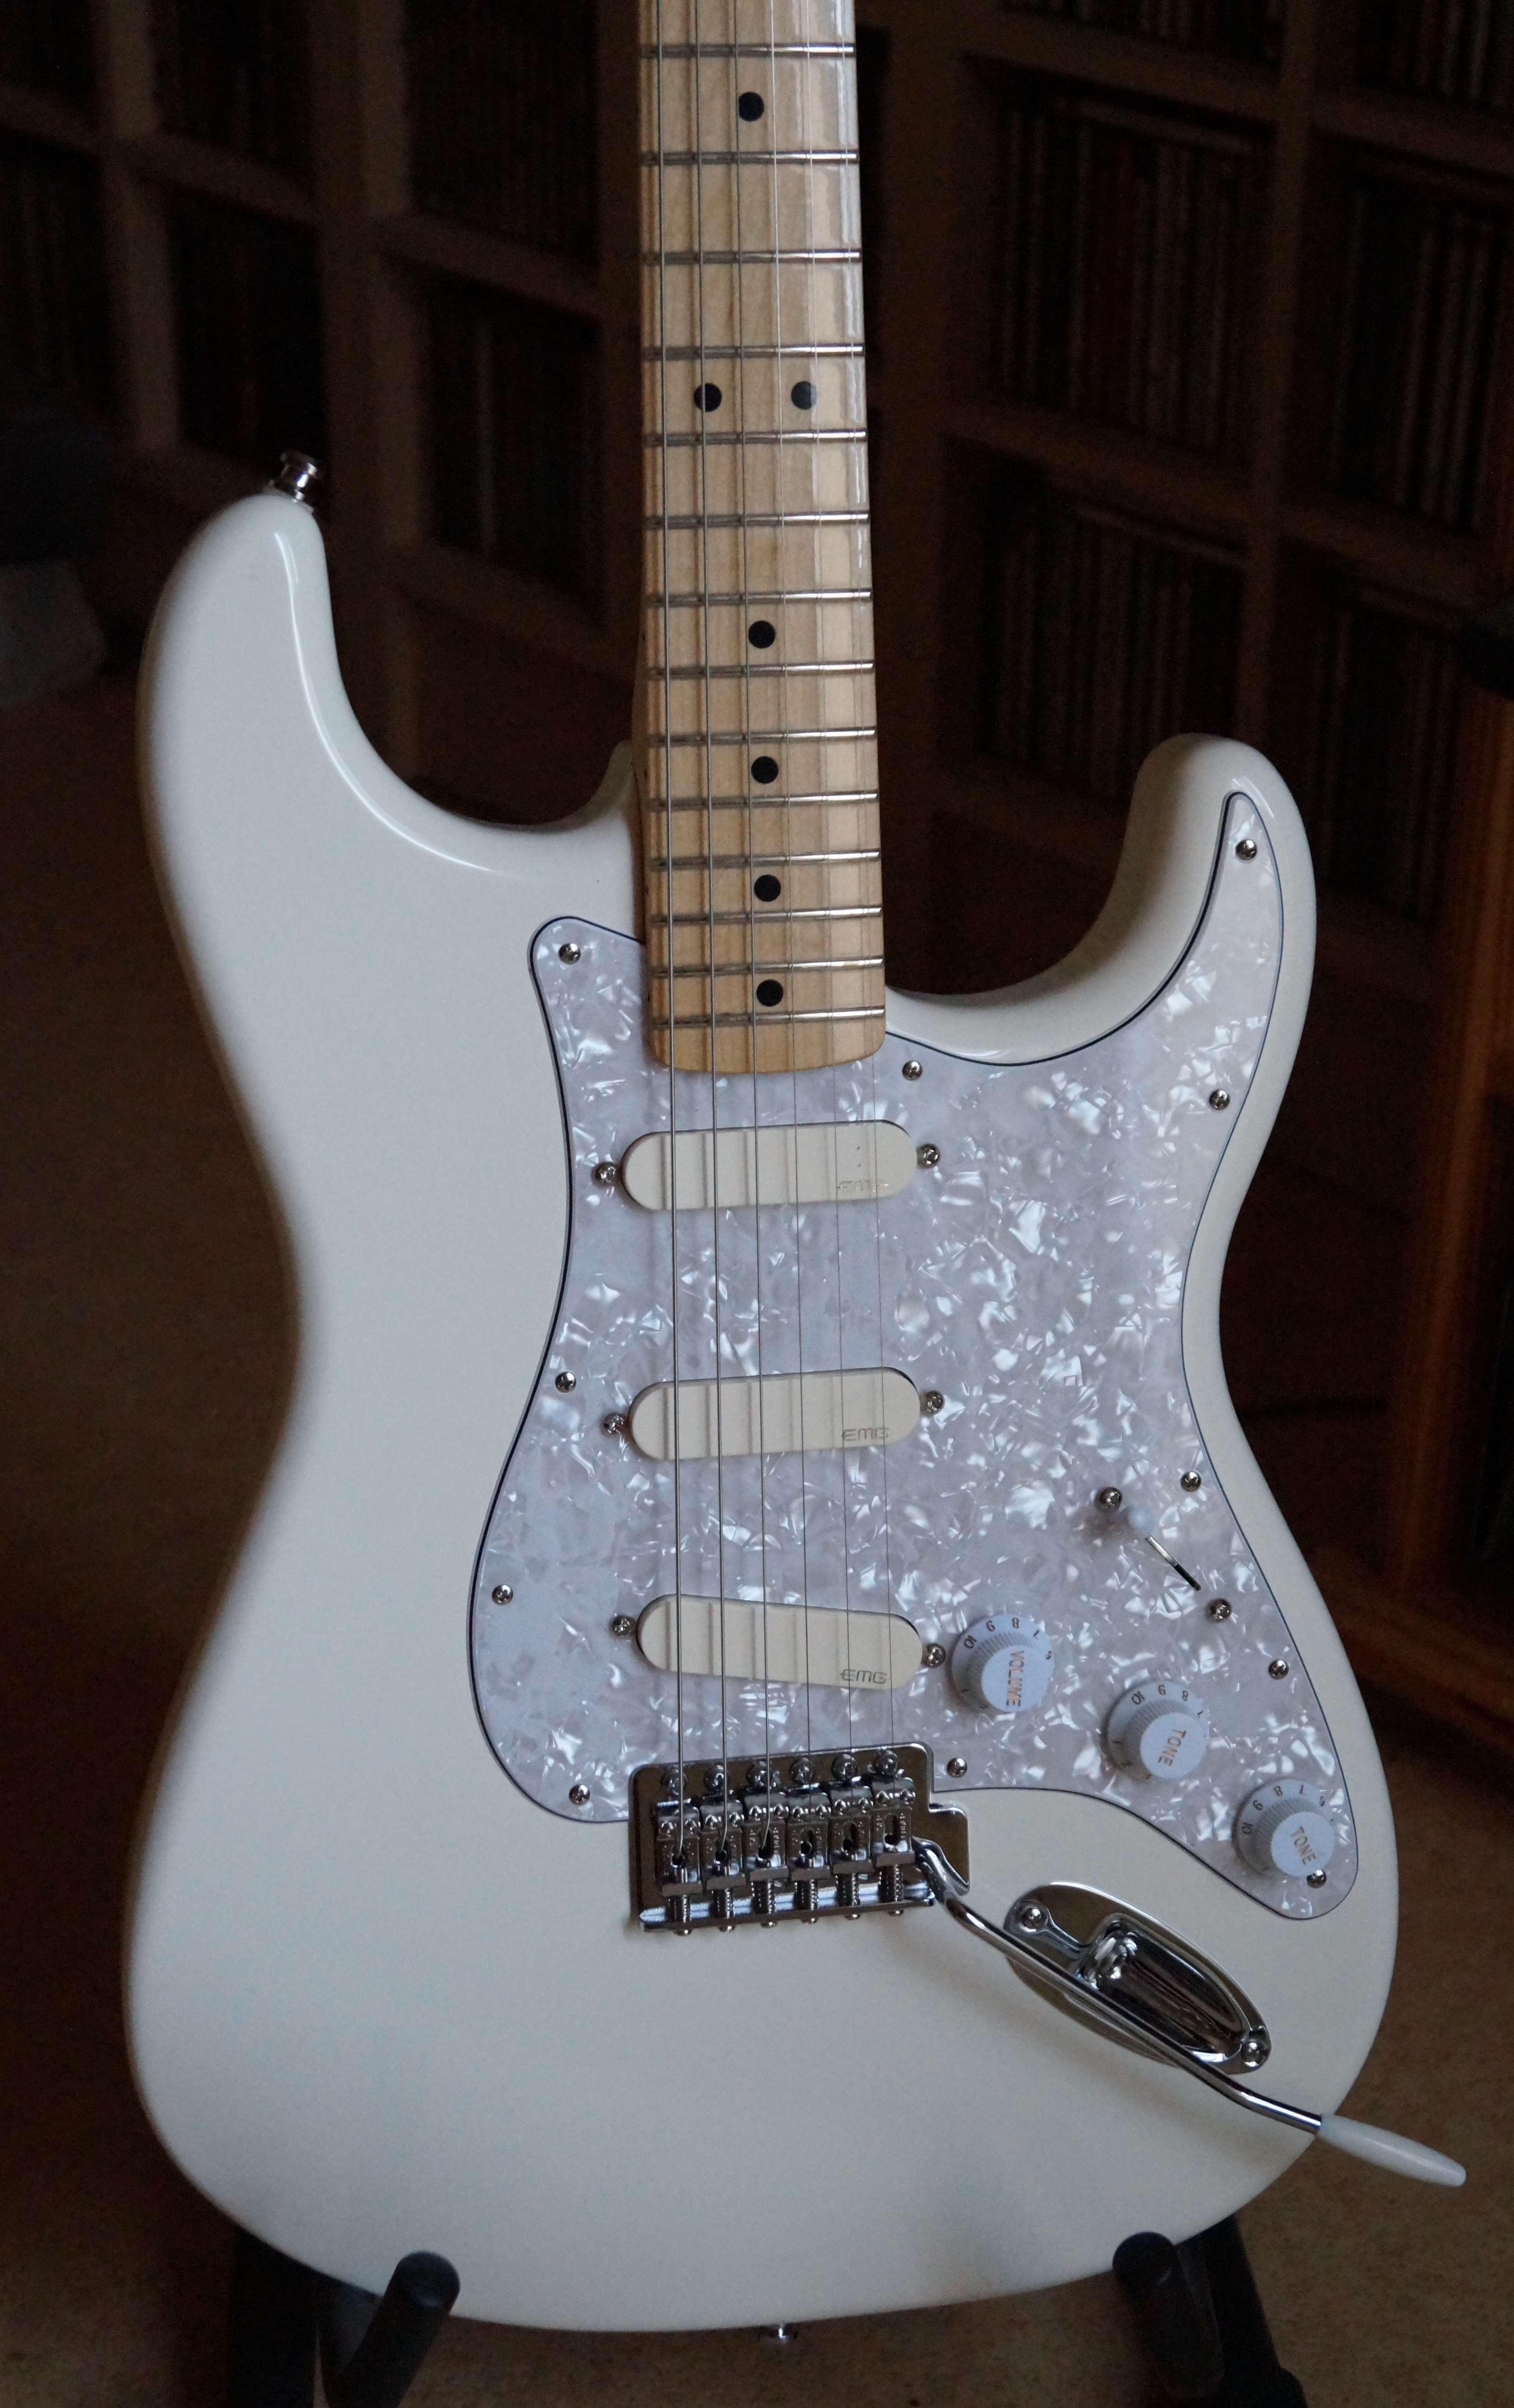 Fender Stratocaster EMG DG20, Locking tuners Fender (Ile-de